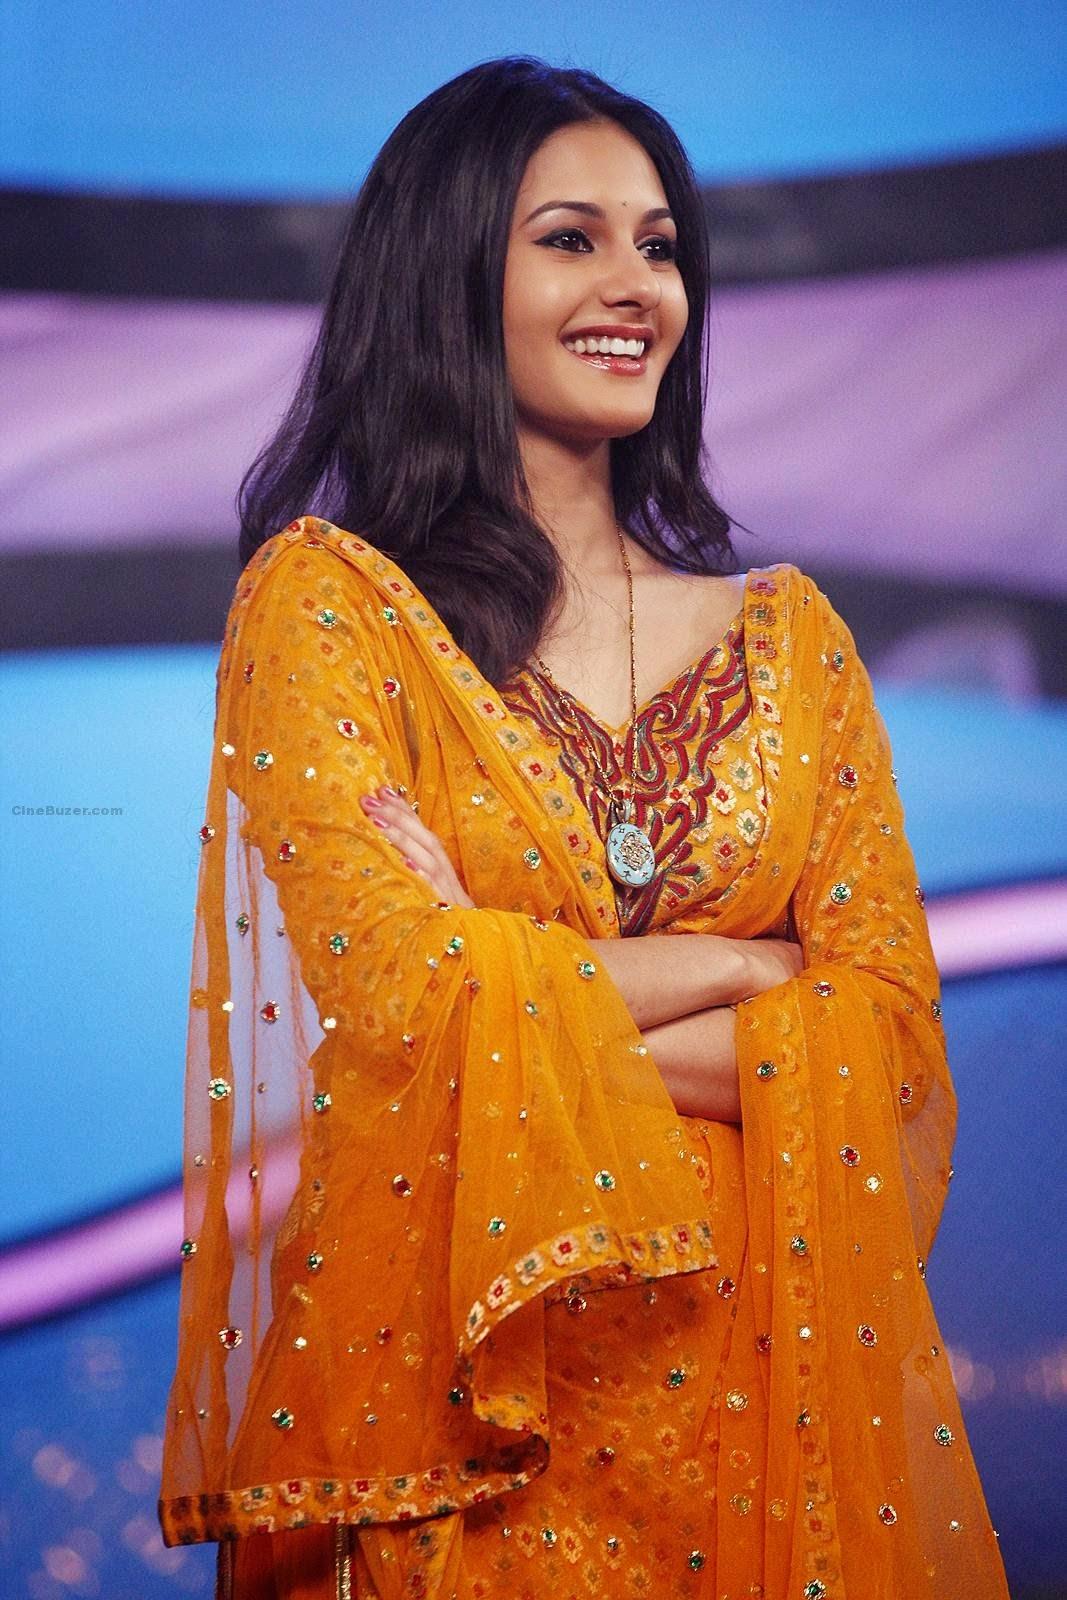 Amyra Dastur sexy wallpaper smile closeup dress hair style personal ...